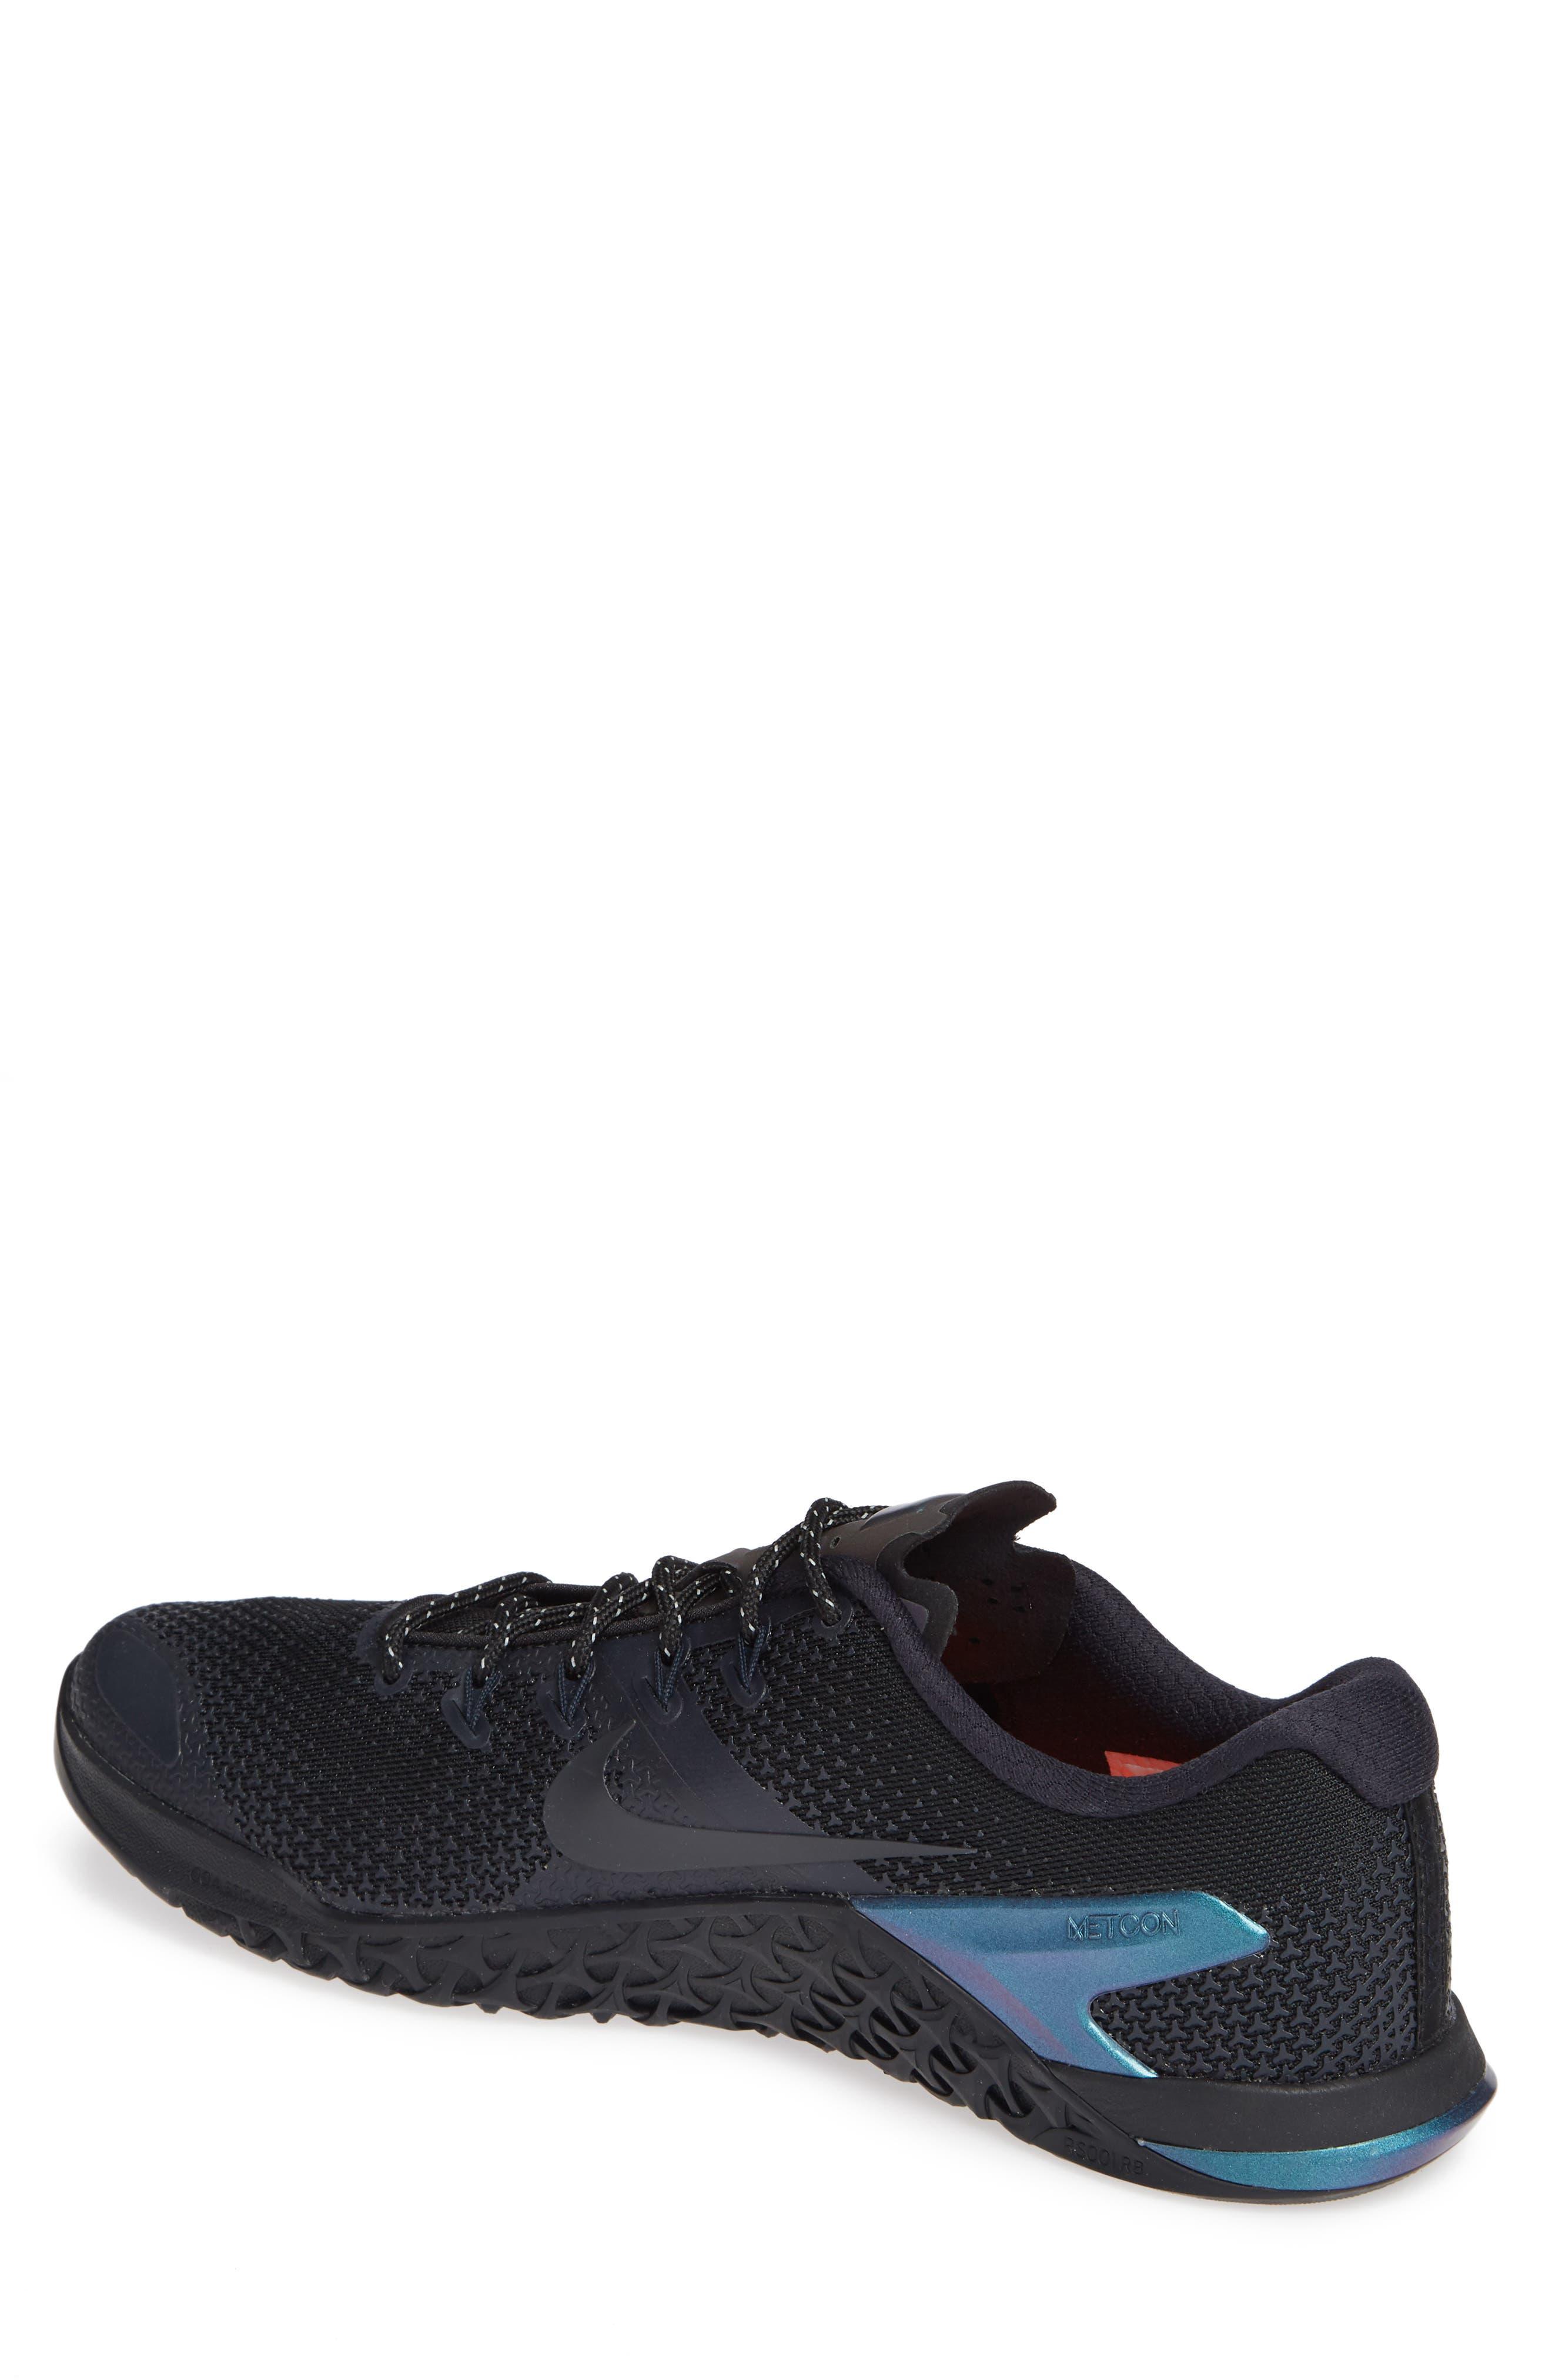 NIKE,                             Metcon 4 Prem Training Shoe,                             Alternate thumbnail 2, color,                             BLACK/ BLACK/ DARK OBSIDIAN